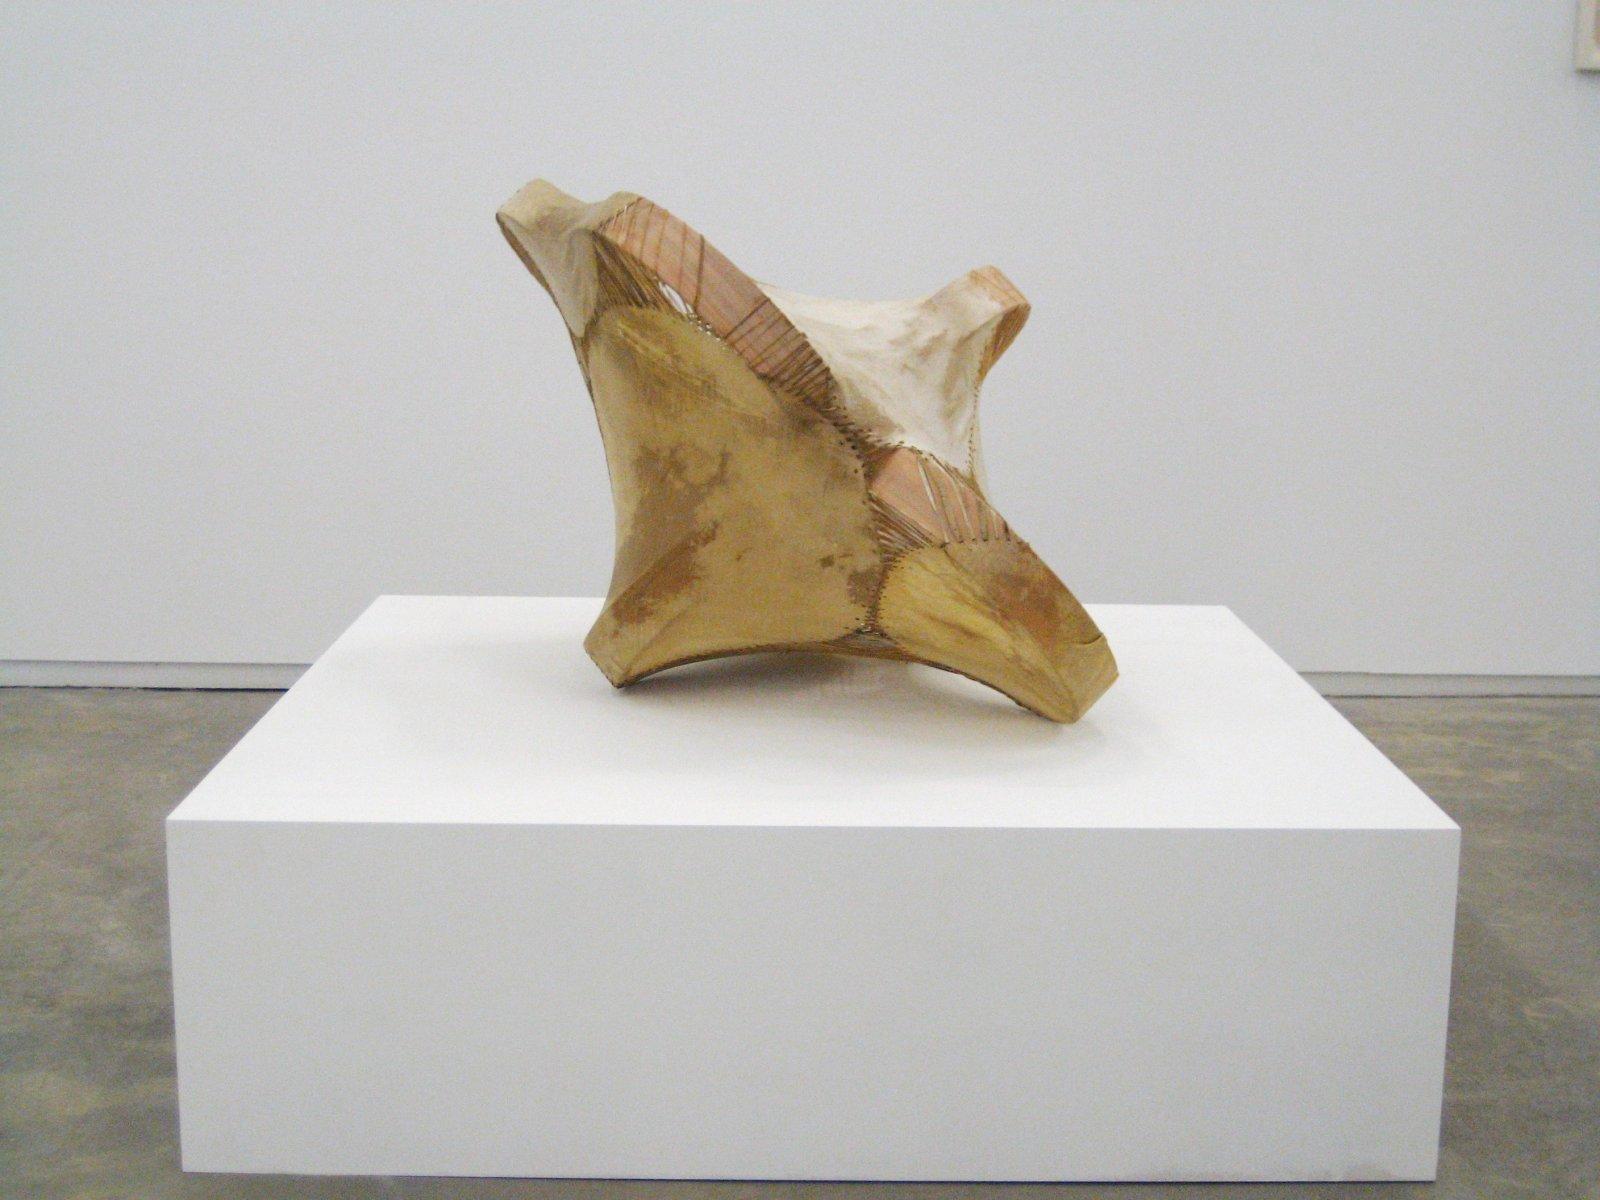 Brian Jungen,Sound Space II, 2010, willow, birch, deer and goat hide, 25 x 34 x 32 in. (64 x 86 x 81 cm)